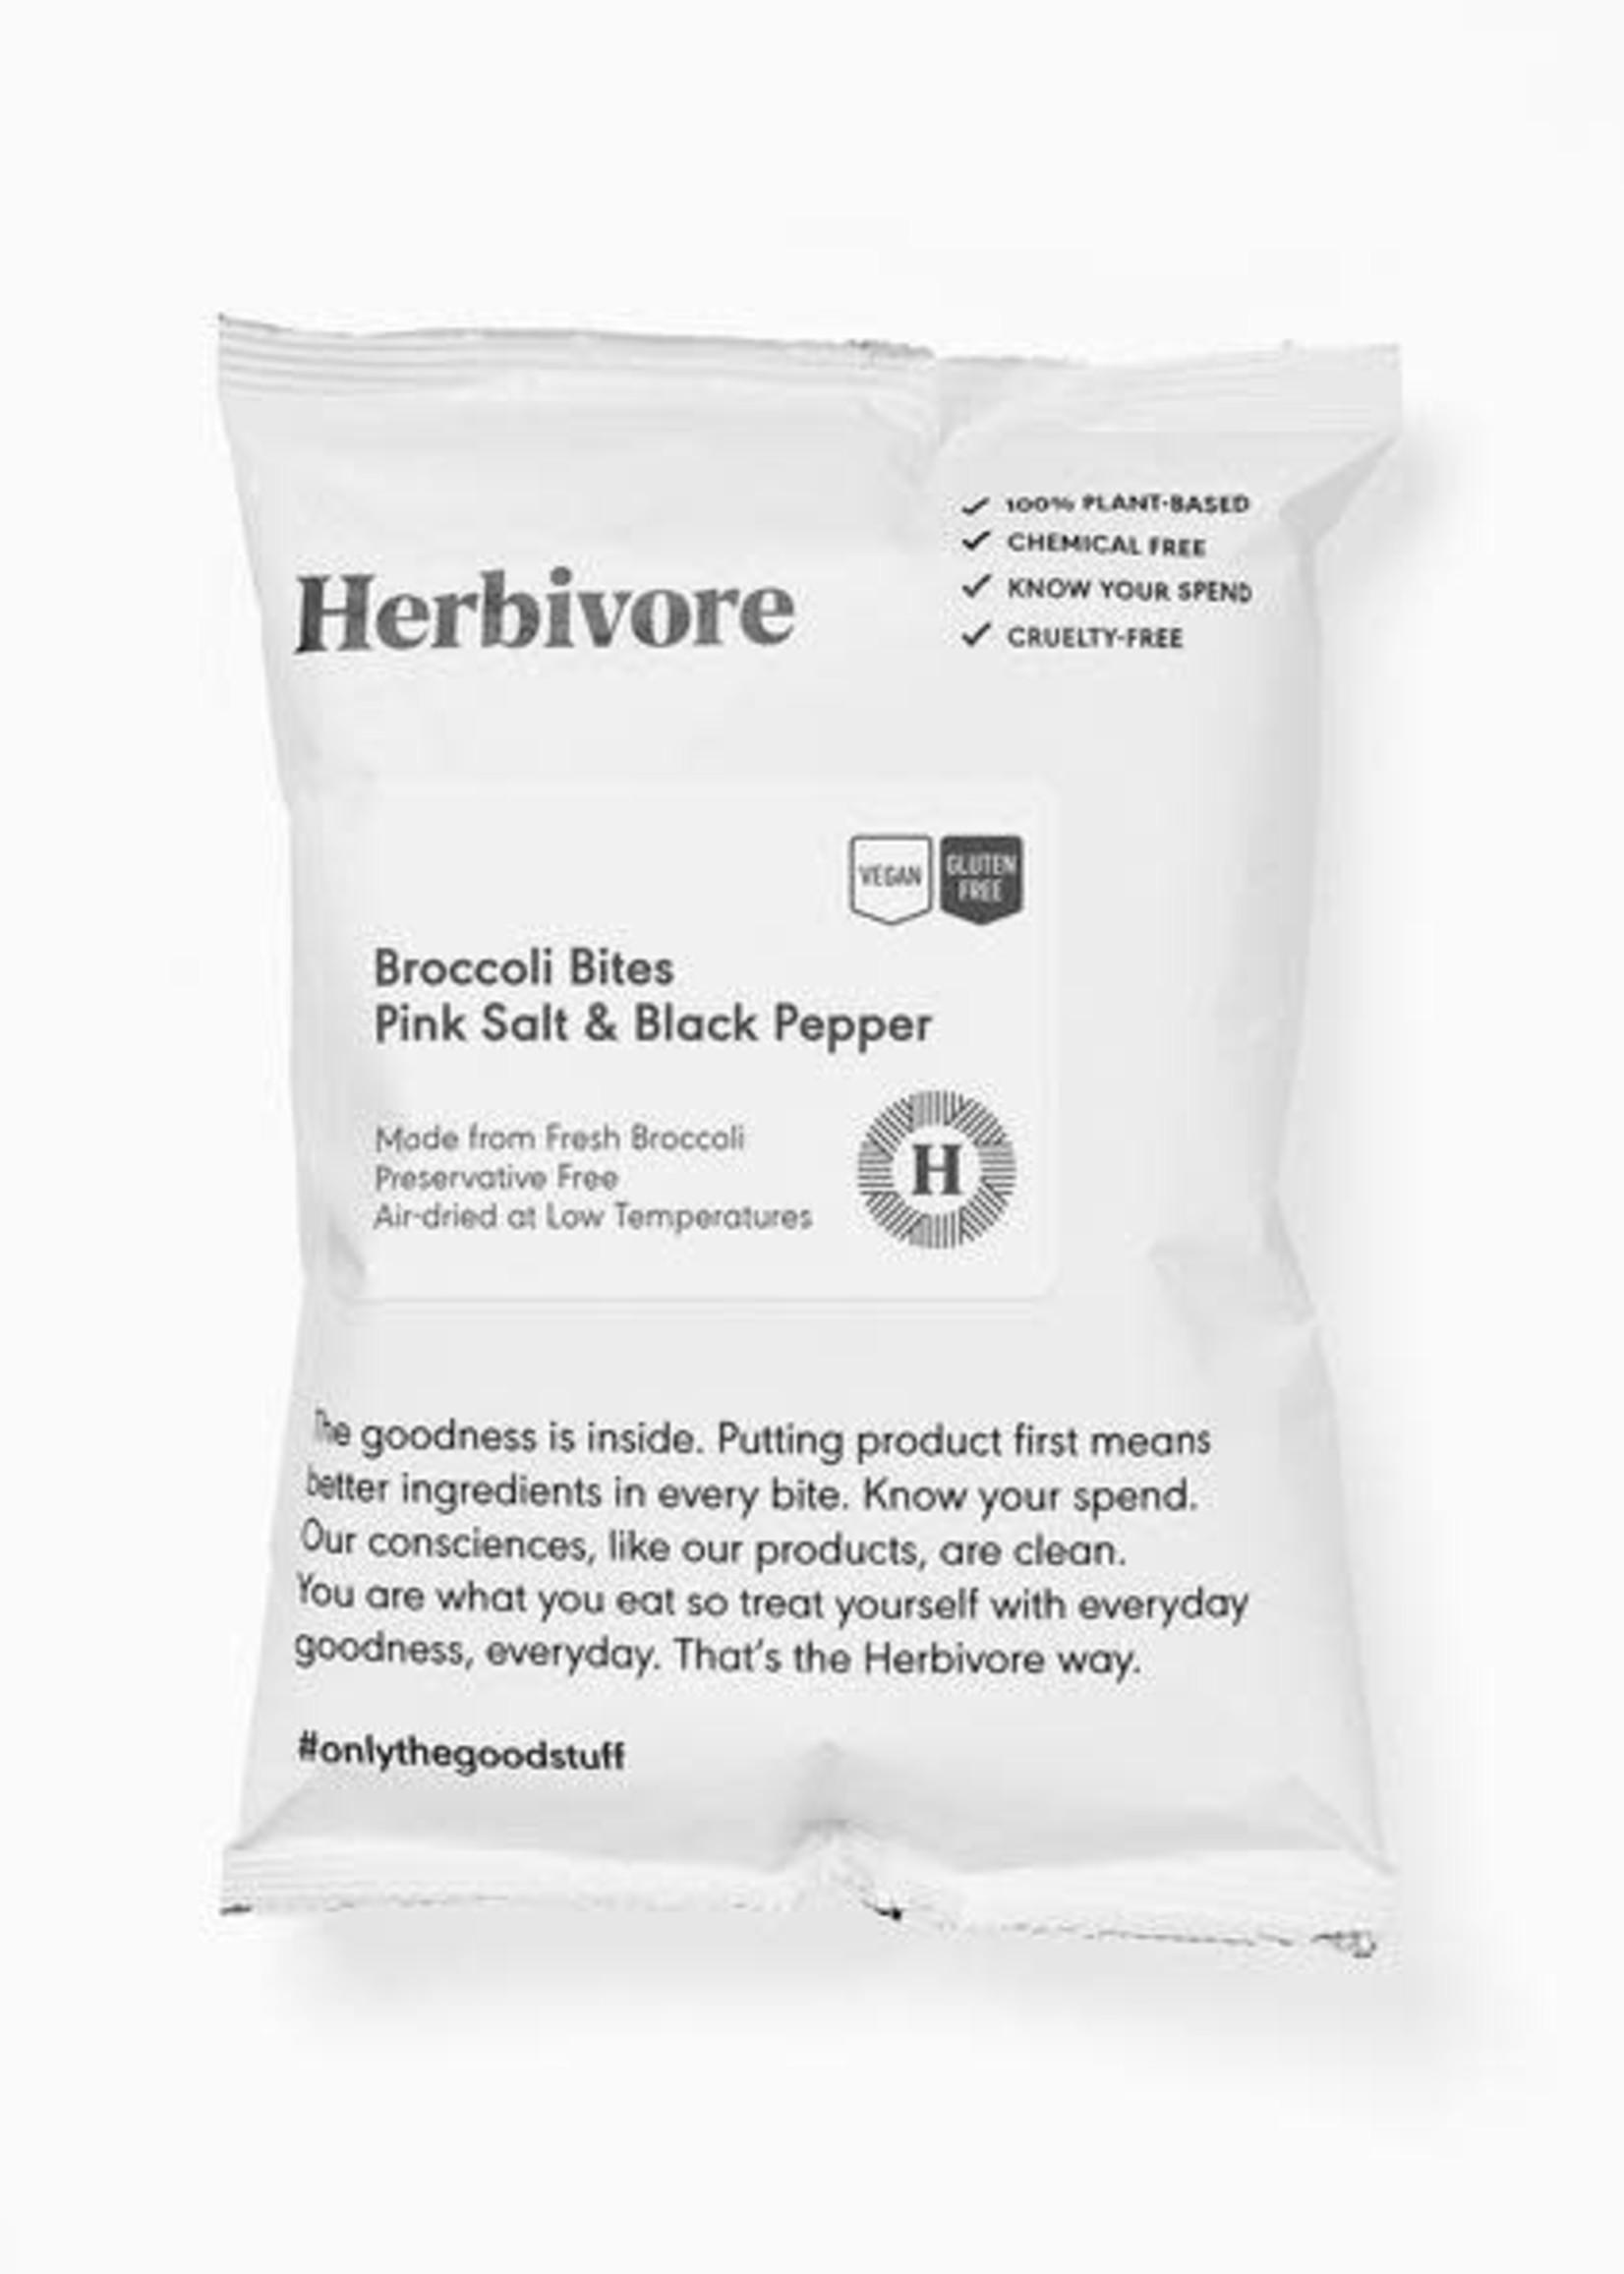 Herbivore - Broccoli Bites pink salt & black pepper